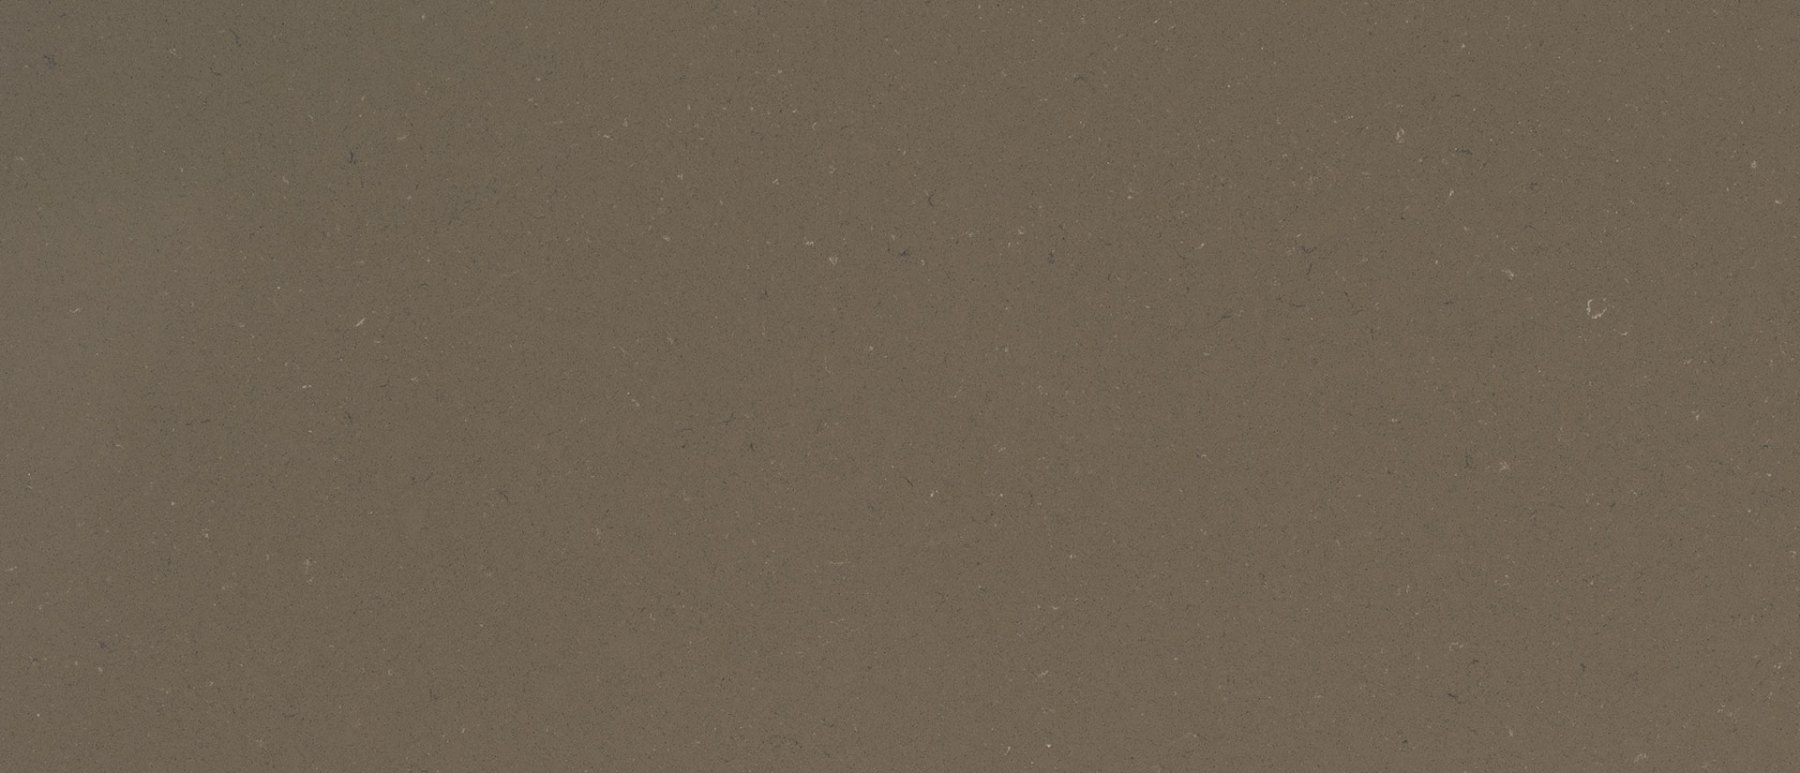 fossil-brown-quartz-1